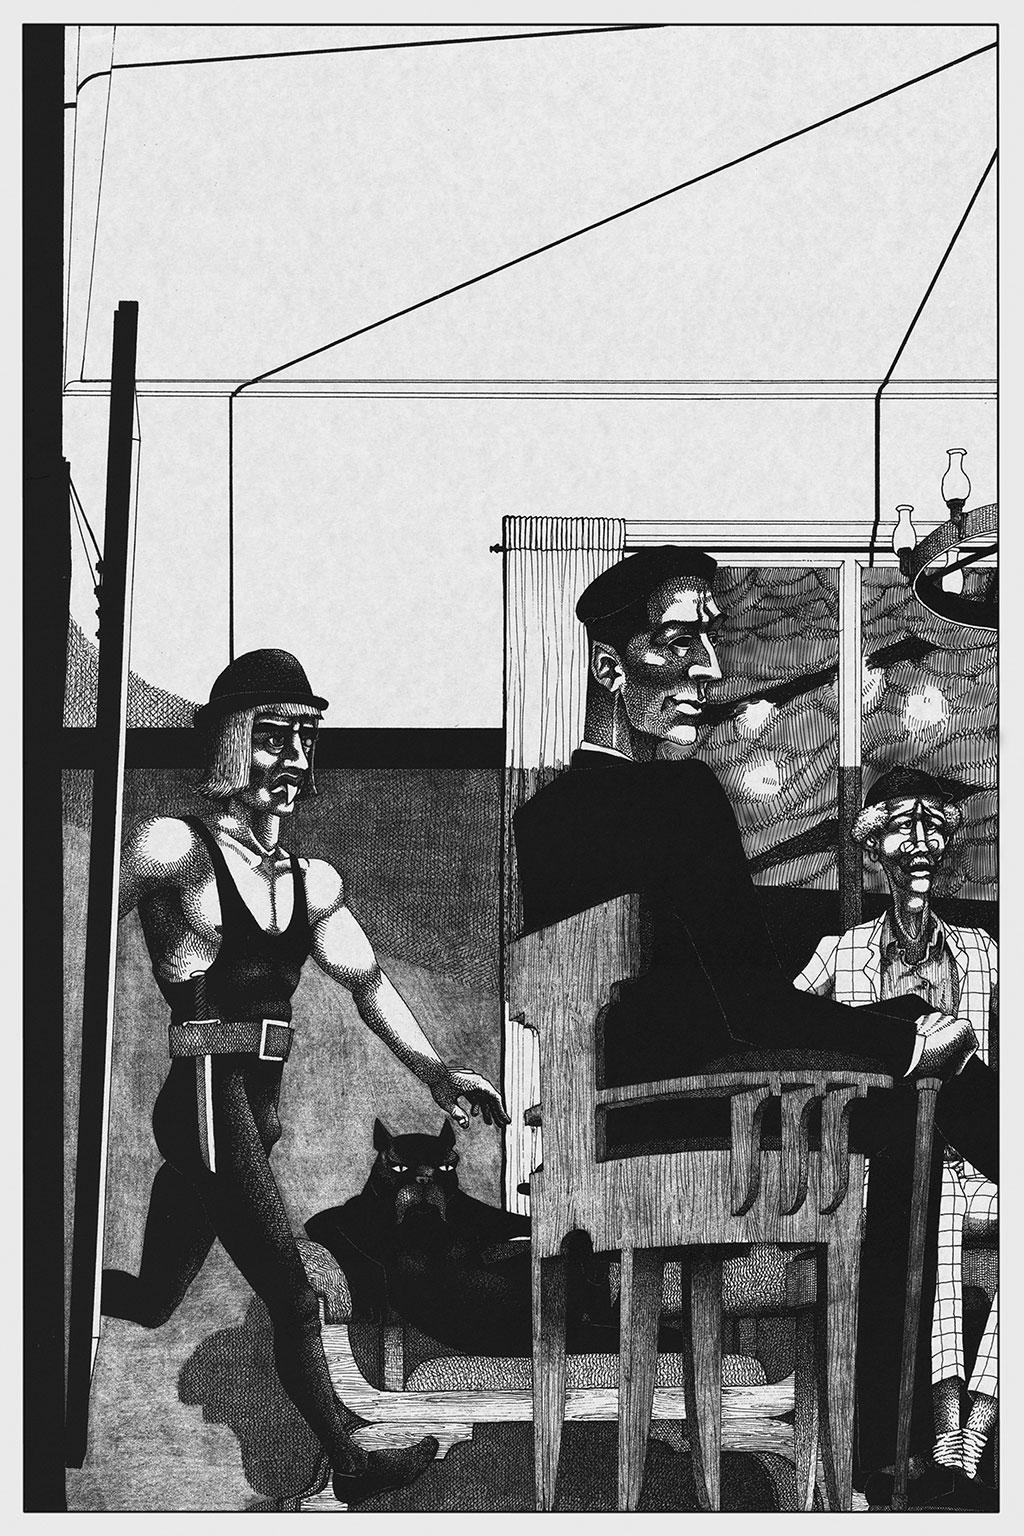 Иллюстрация Мастер и Маргарита Чарли Стоун 5